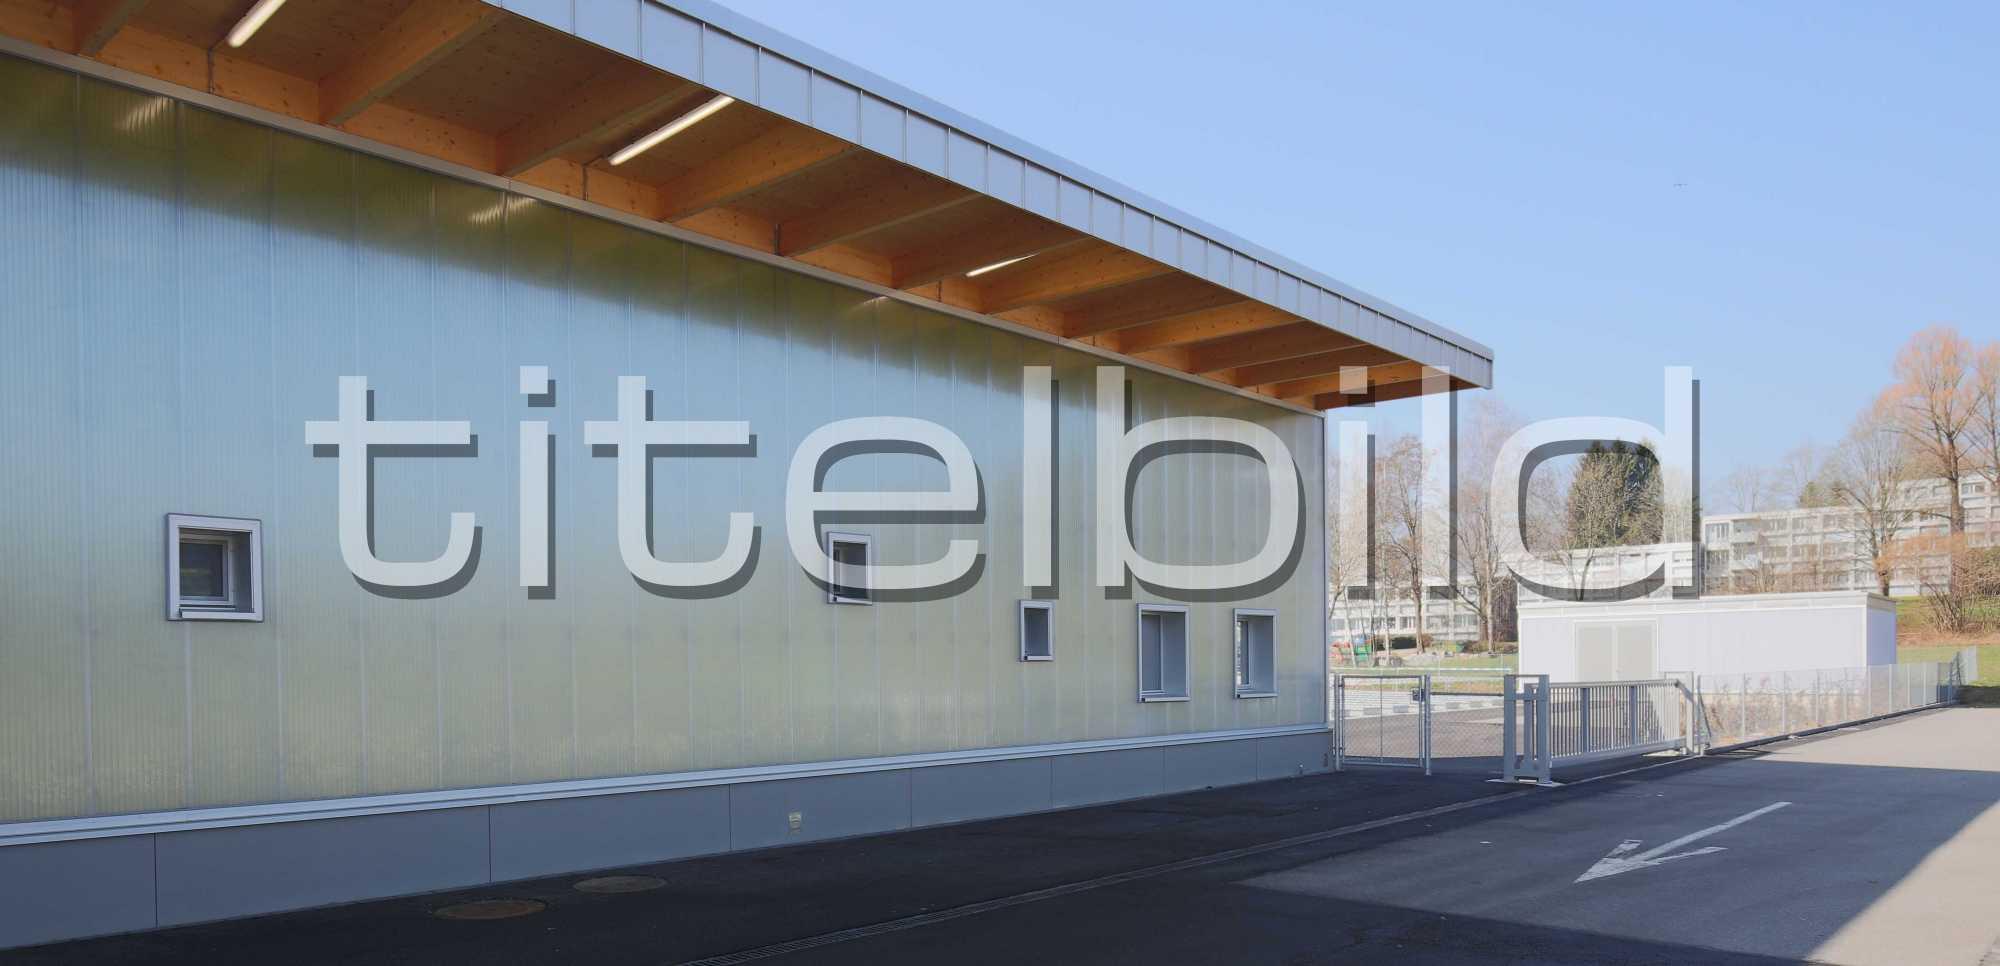 Projektbild-Nr. 4: Gewächshaus